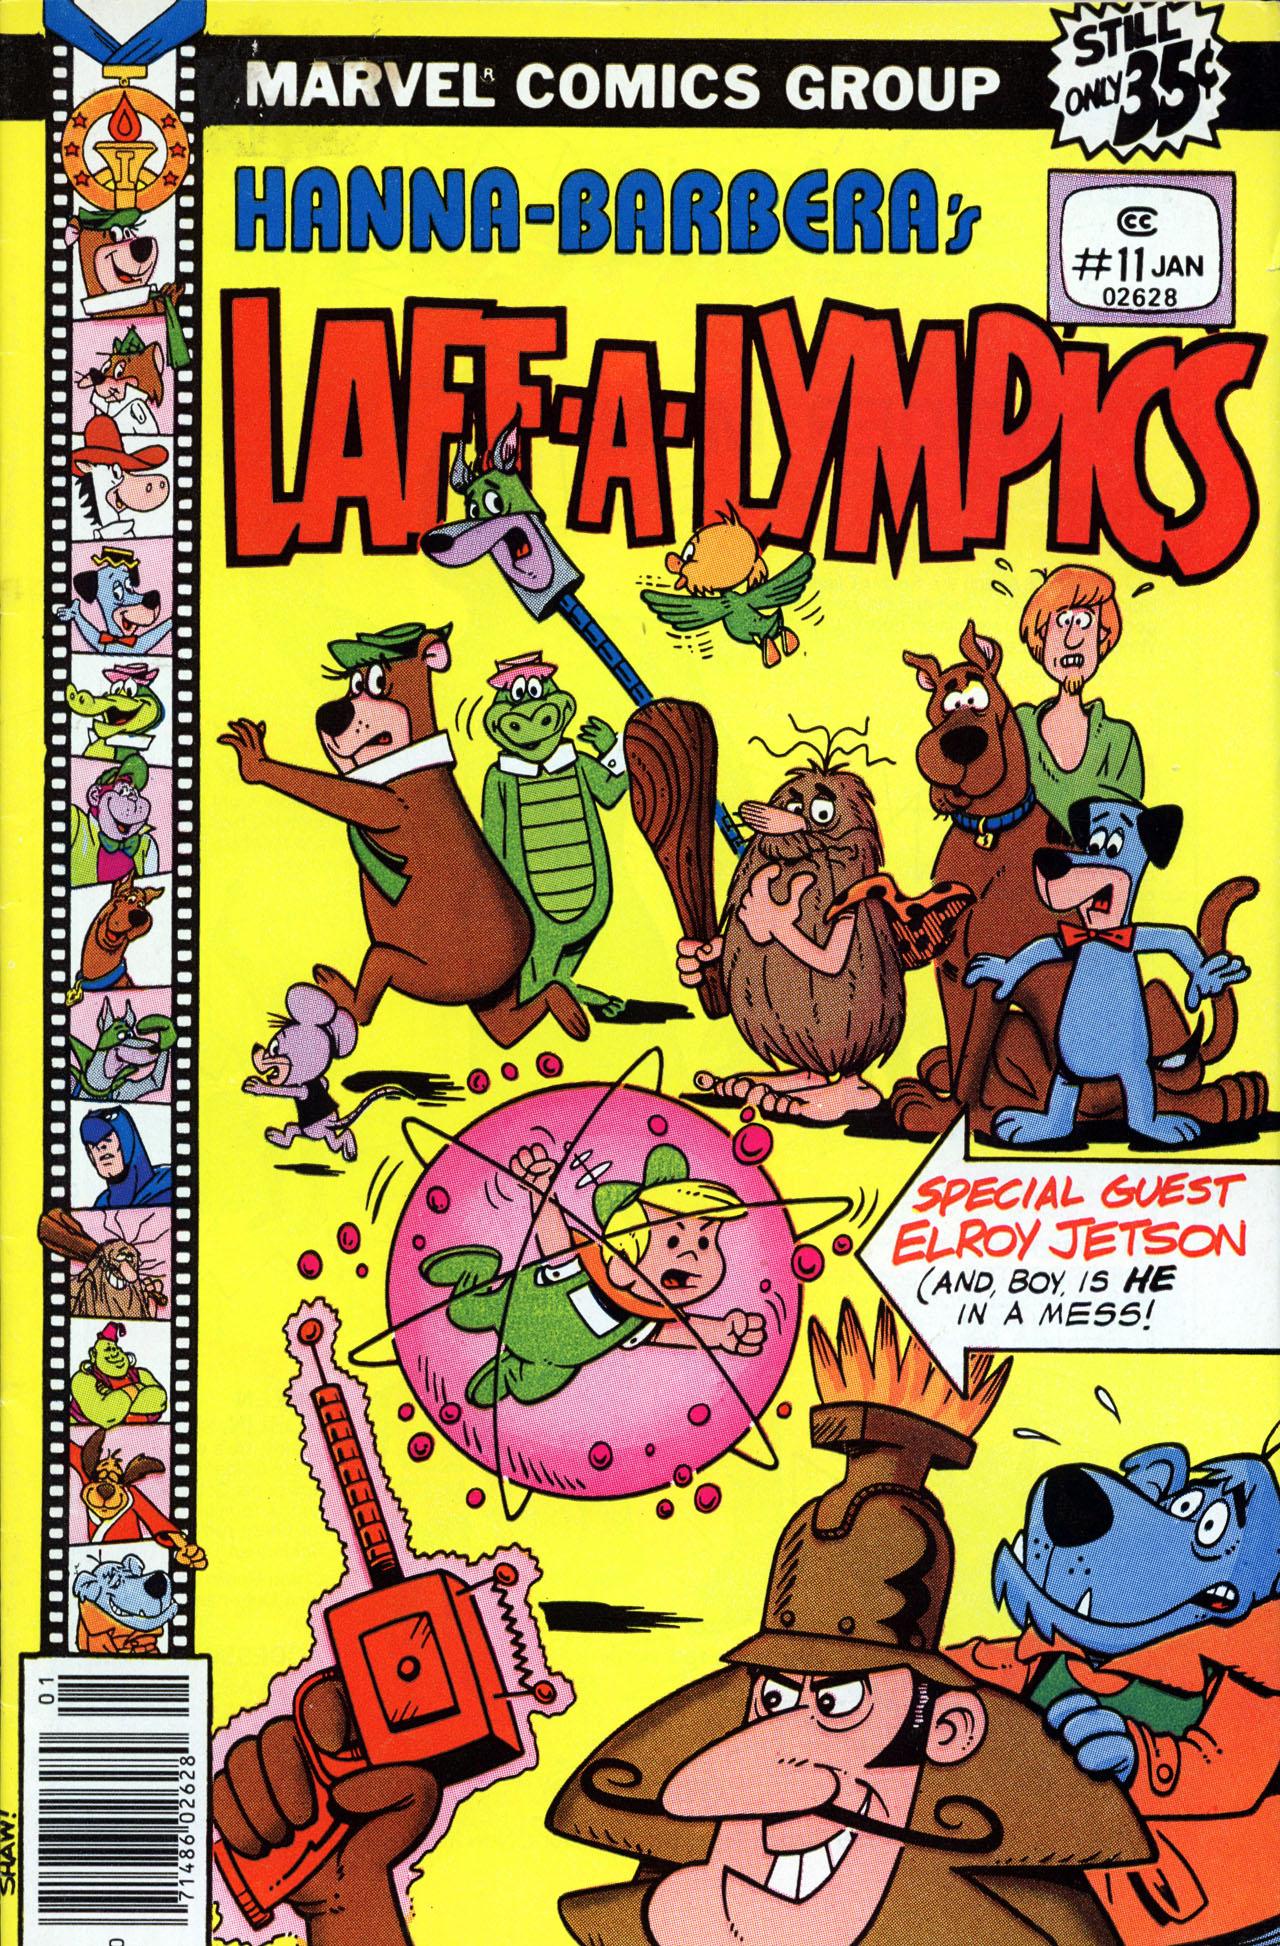 Laff-a-lympics 11 Page 1